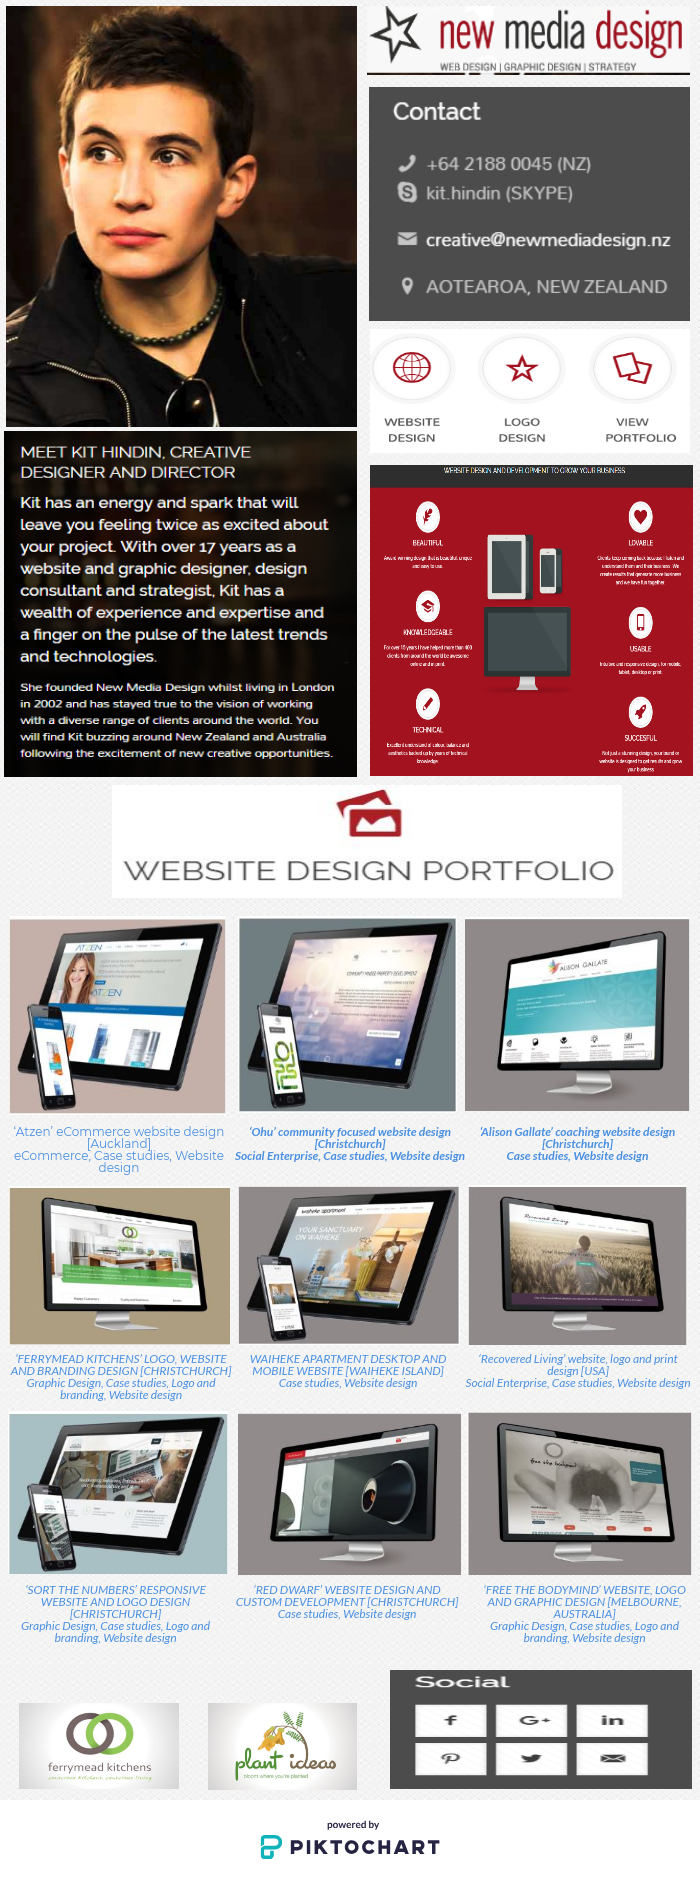 Web Design Auckland Web Developers Auckland Nz With Images Web Design Design Professional Web Design